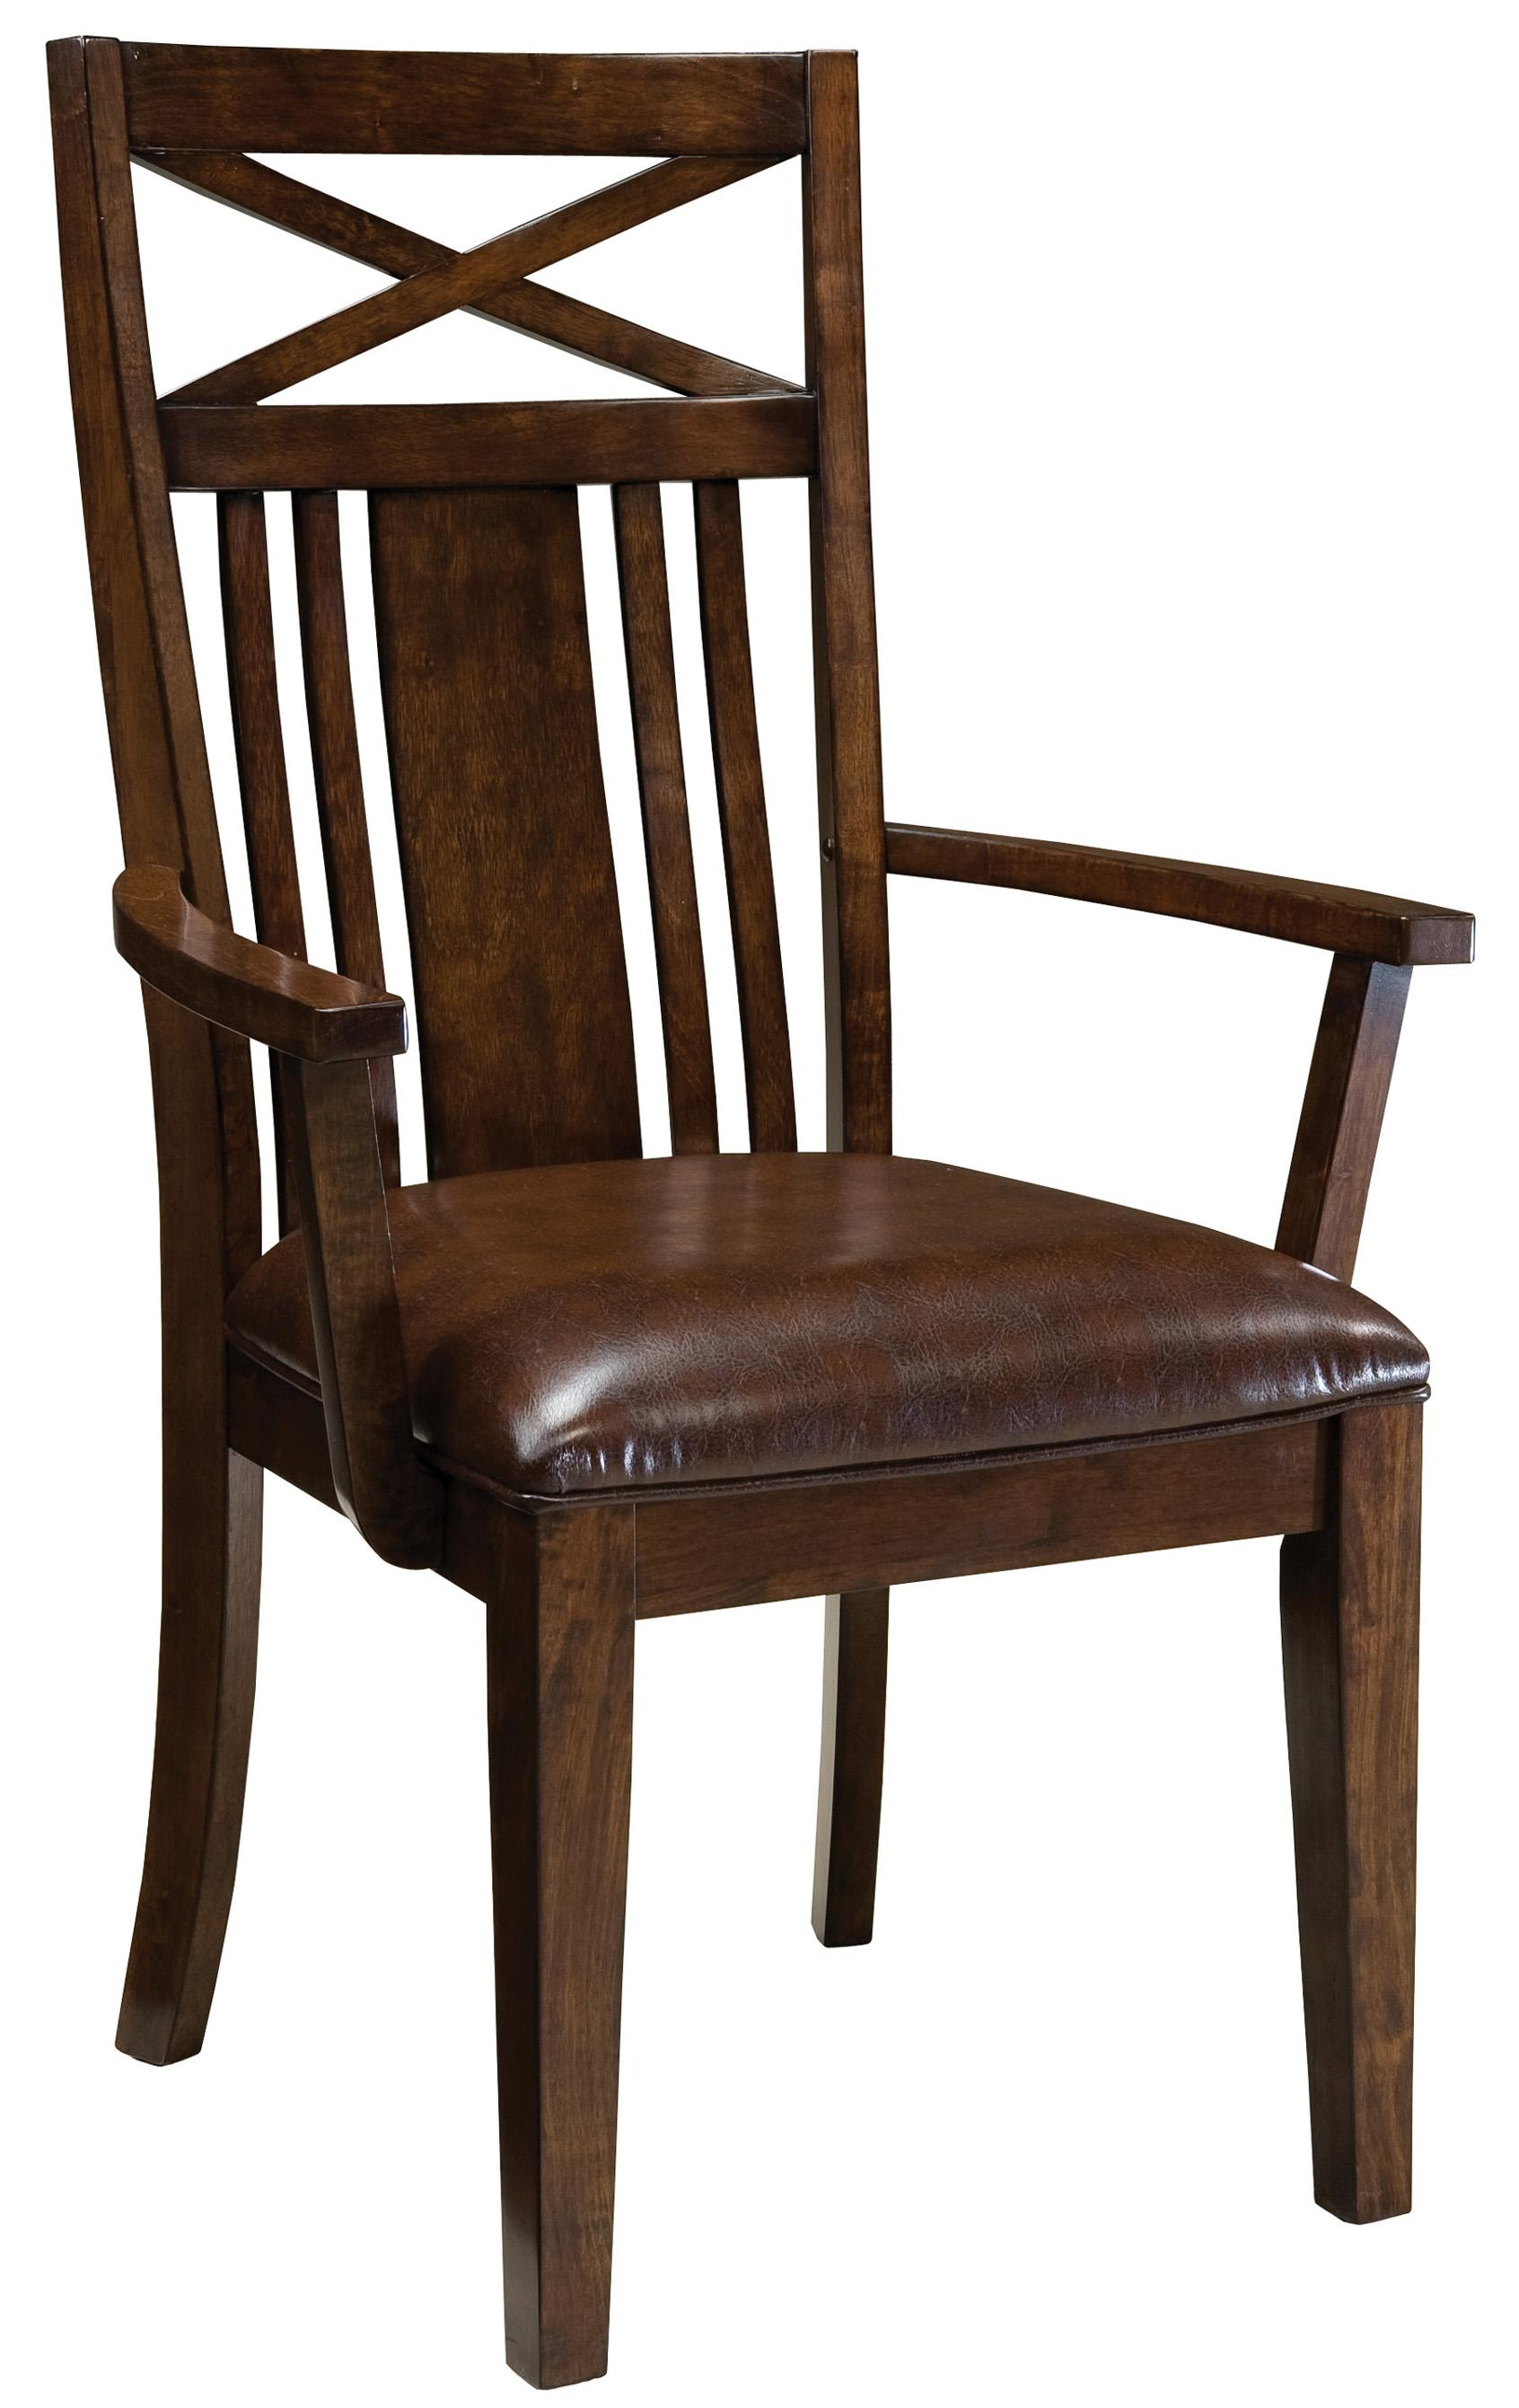 Standard Furniture Sonoma Arm Chair - Item Number: 11905